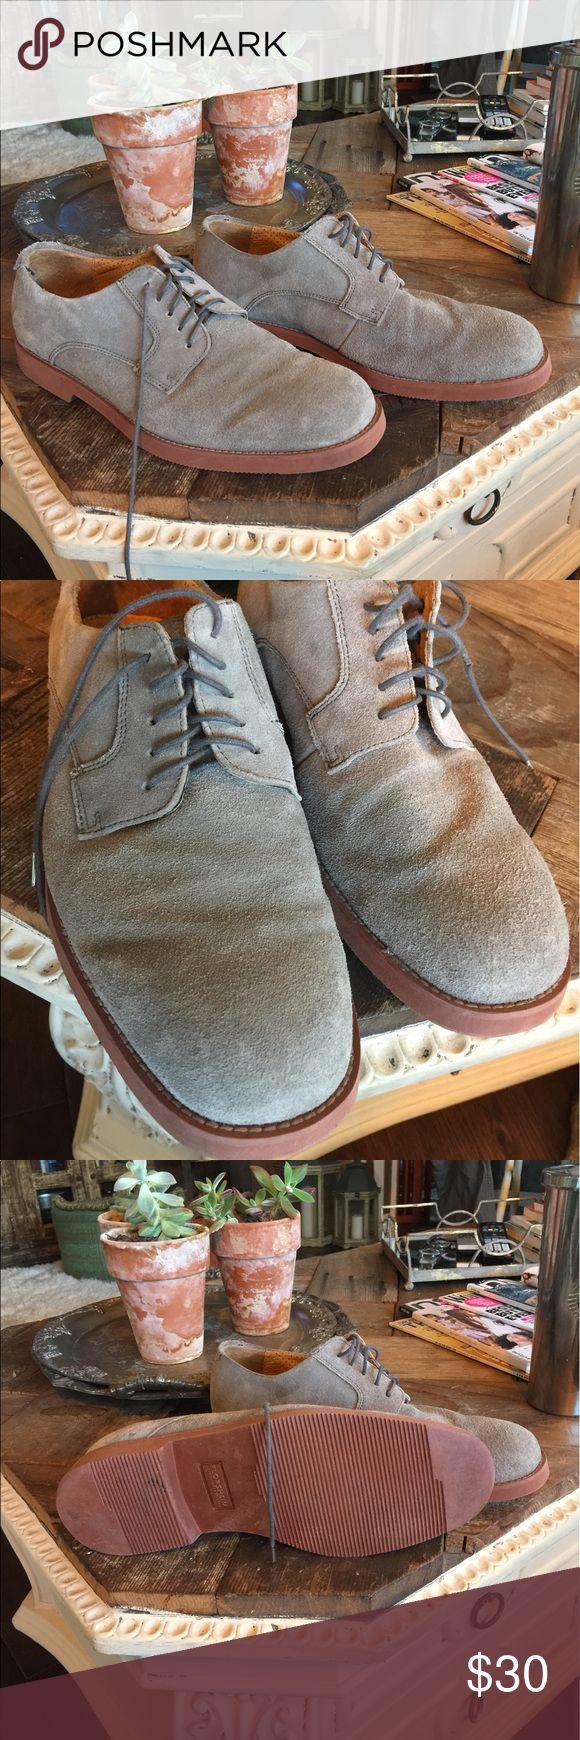 FLORSHIEM MENS OXFORDS Grey suede FLORSHEIM MENS Oxfords worn once.... Florsheim Shoes Oxfords & Derbys